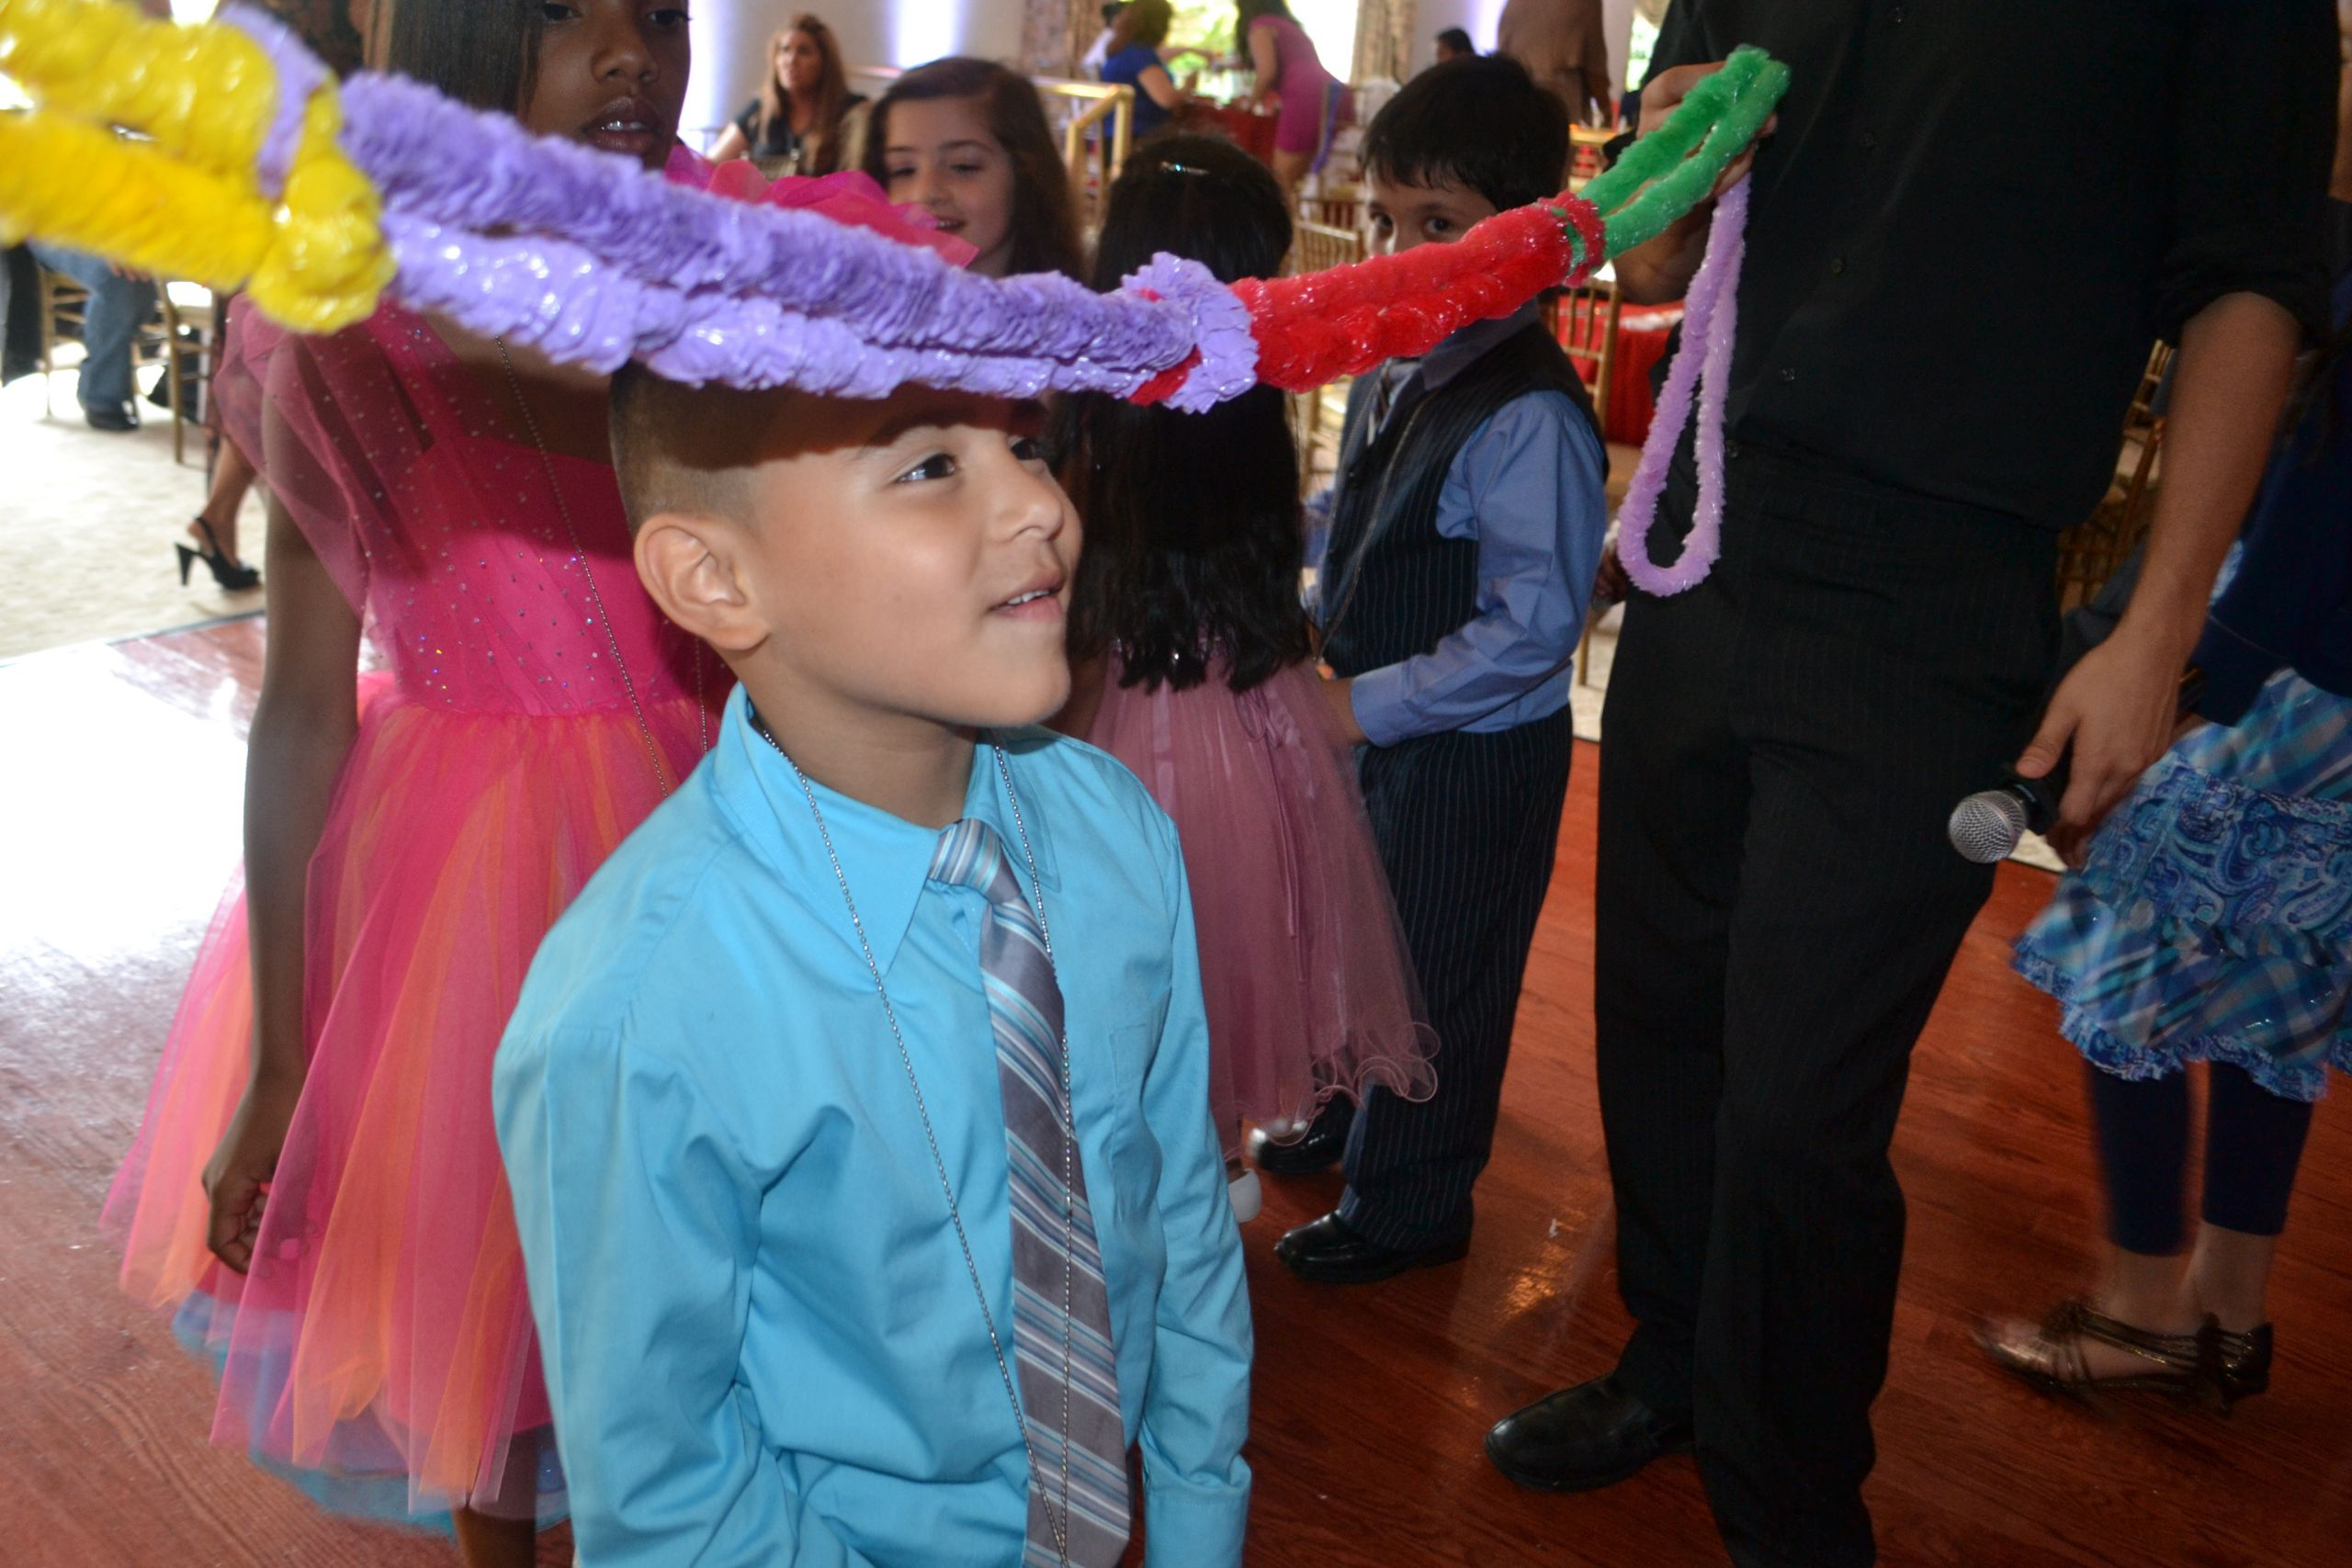 Children Party Entertainment Long Island  Party Entertainment Long Island NY